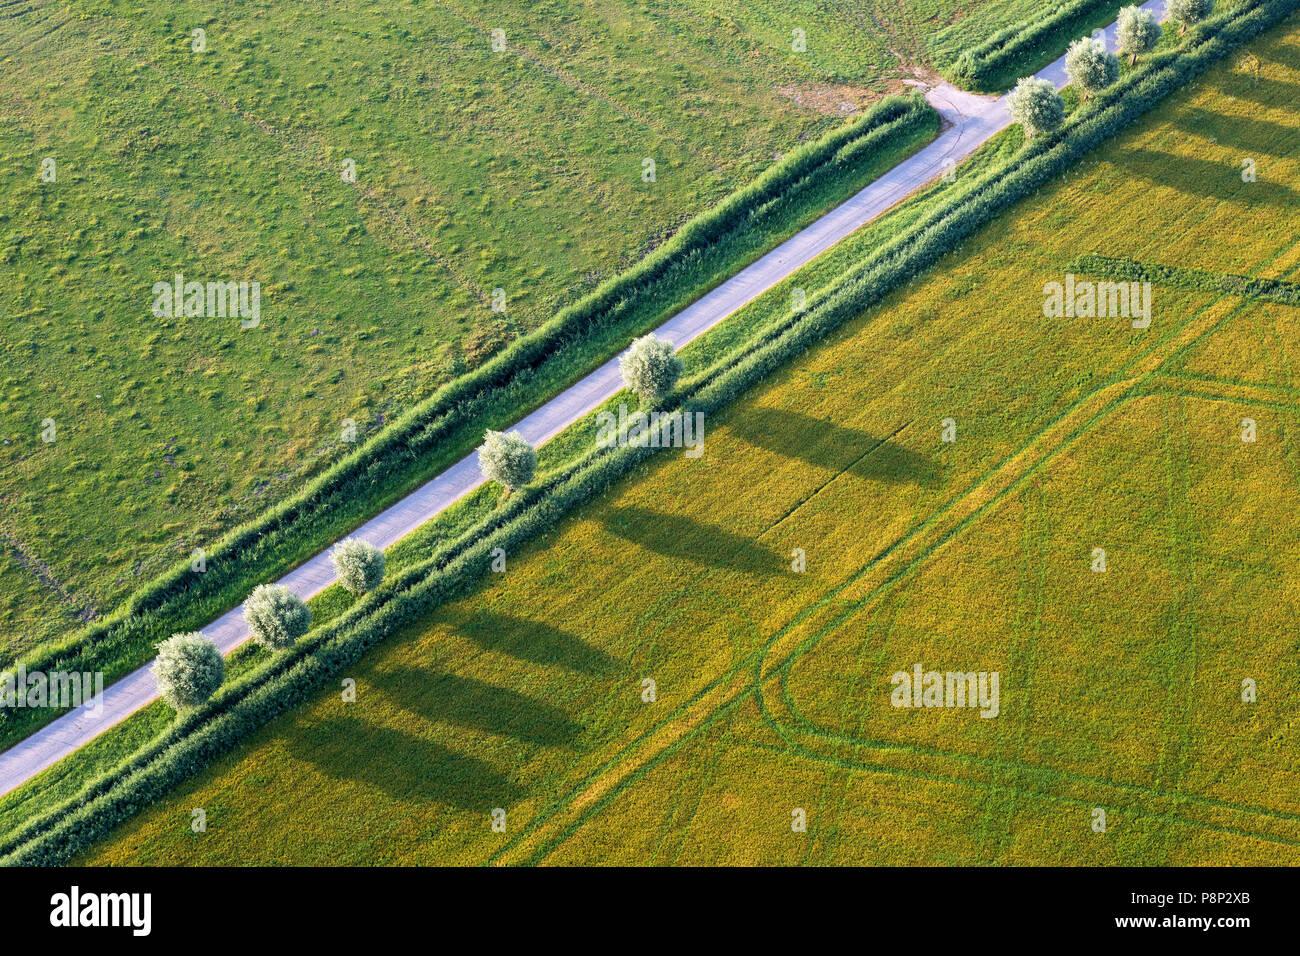 pollard willow trees - Stock Image